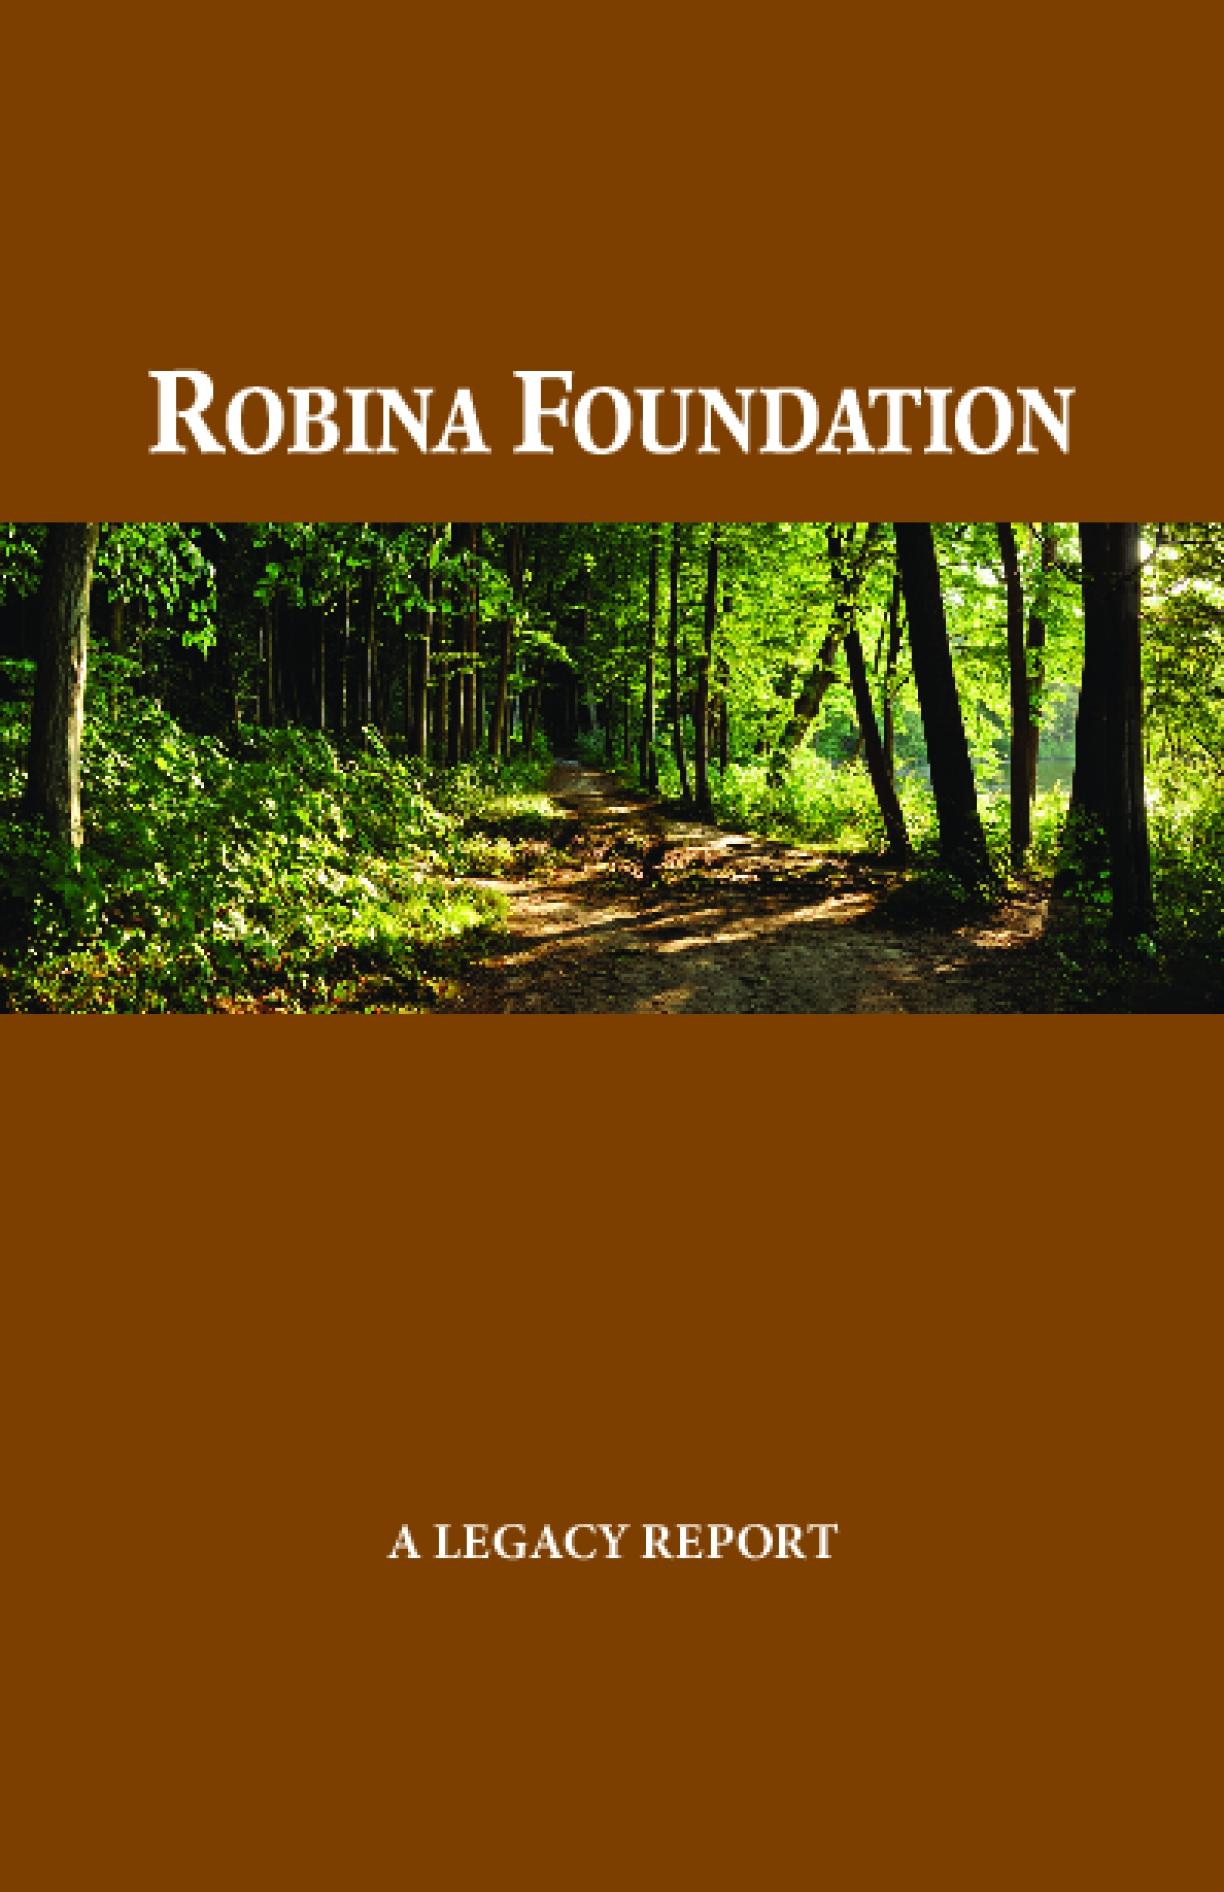 Robina Foundation: A Legacy Report